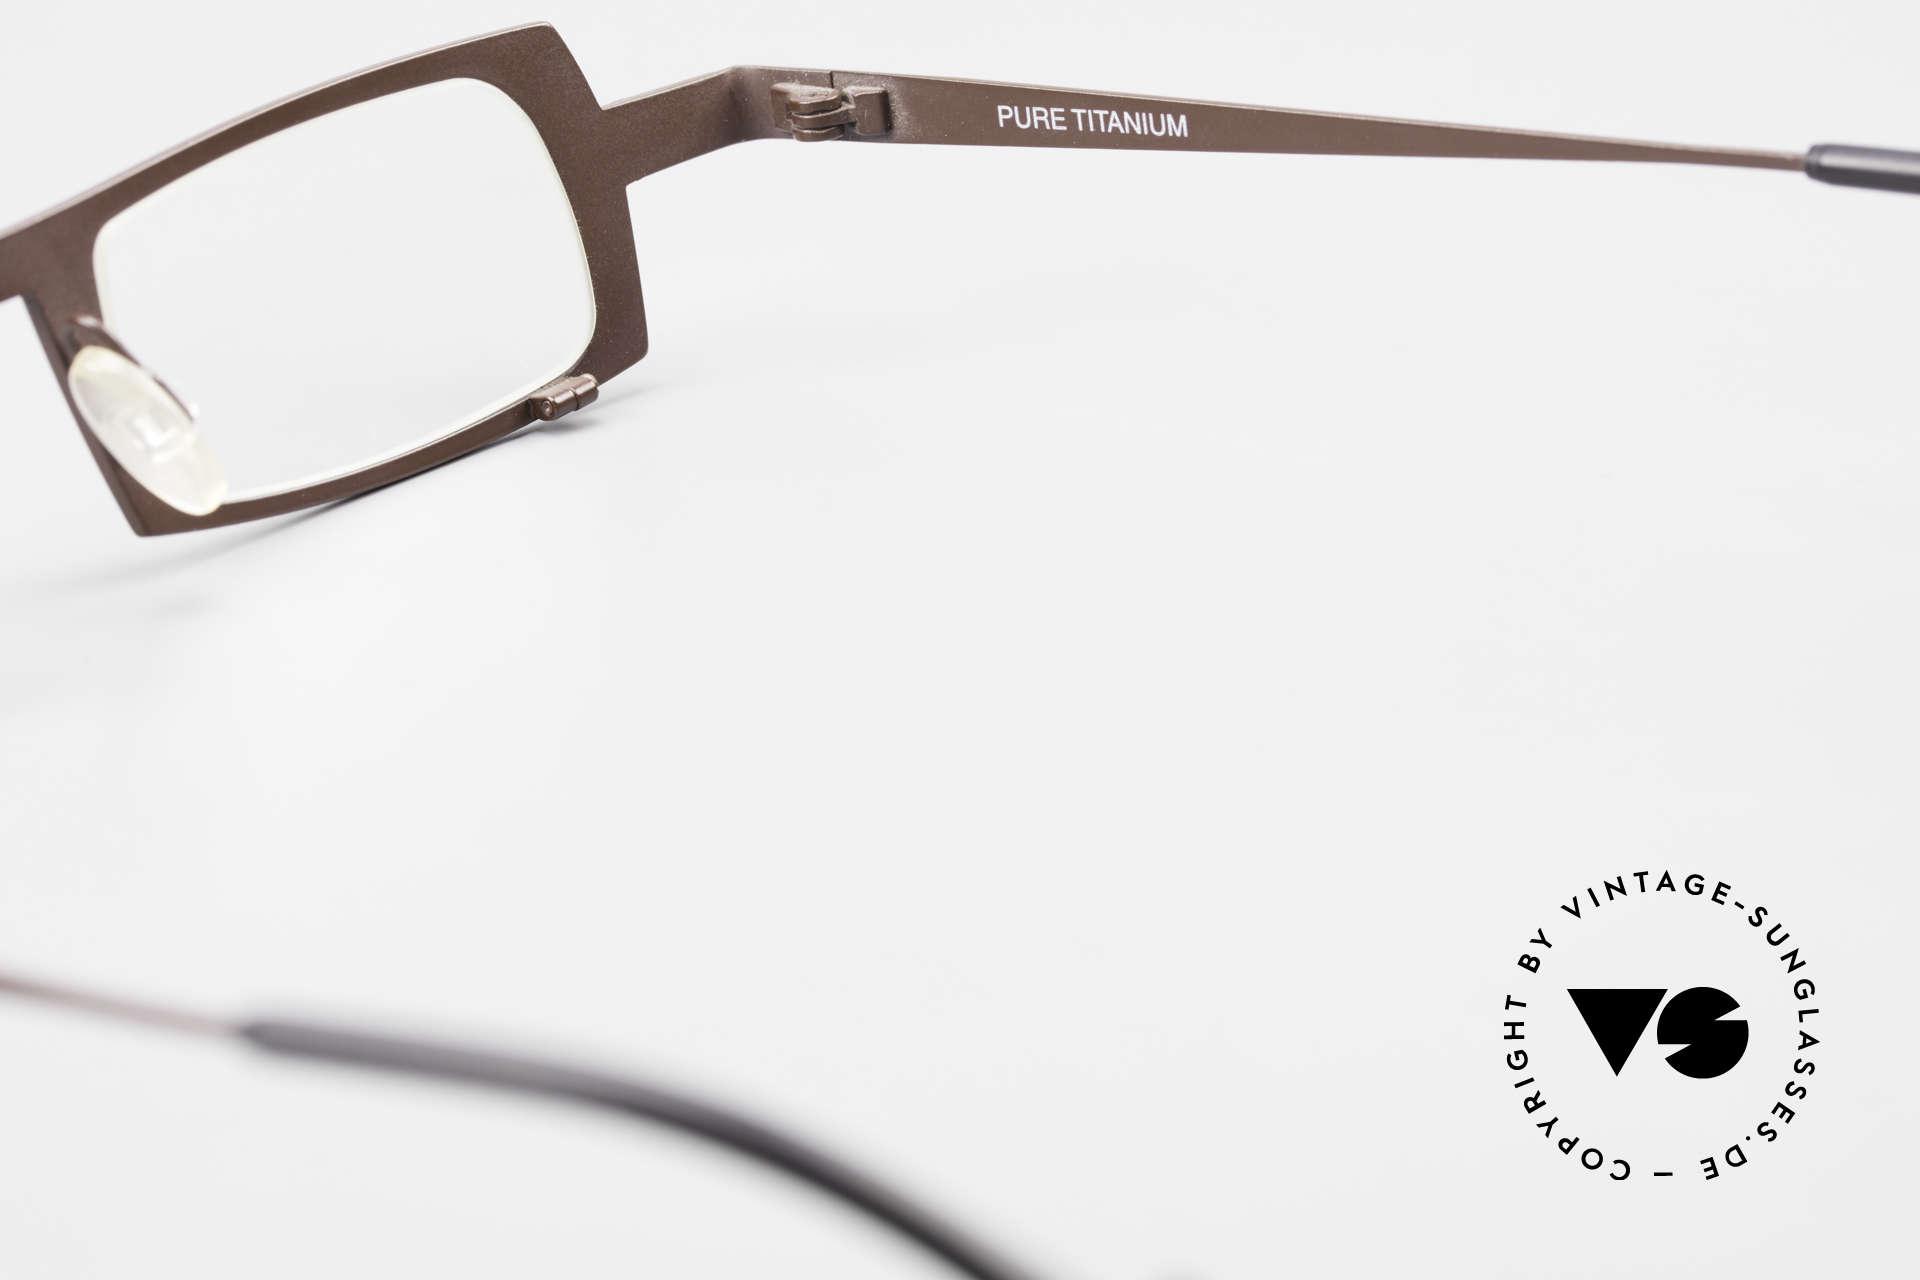 Theo Belgium Wimsey Square Men's Glasses Titanium, Size: large, Made for Men